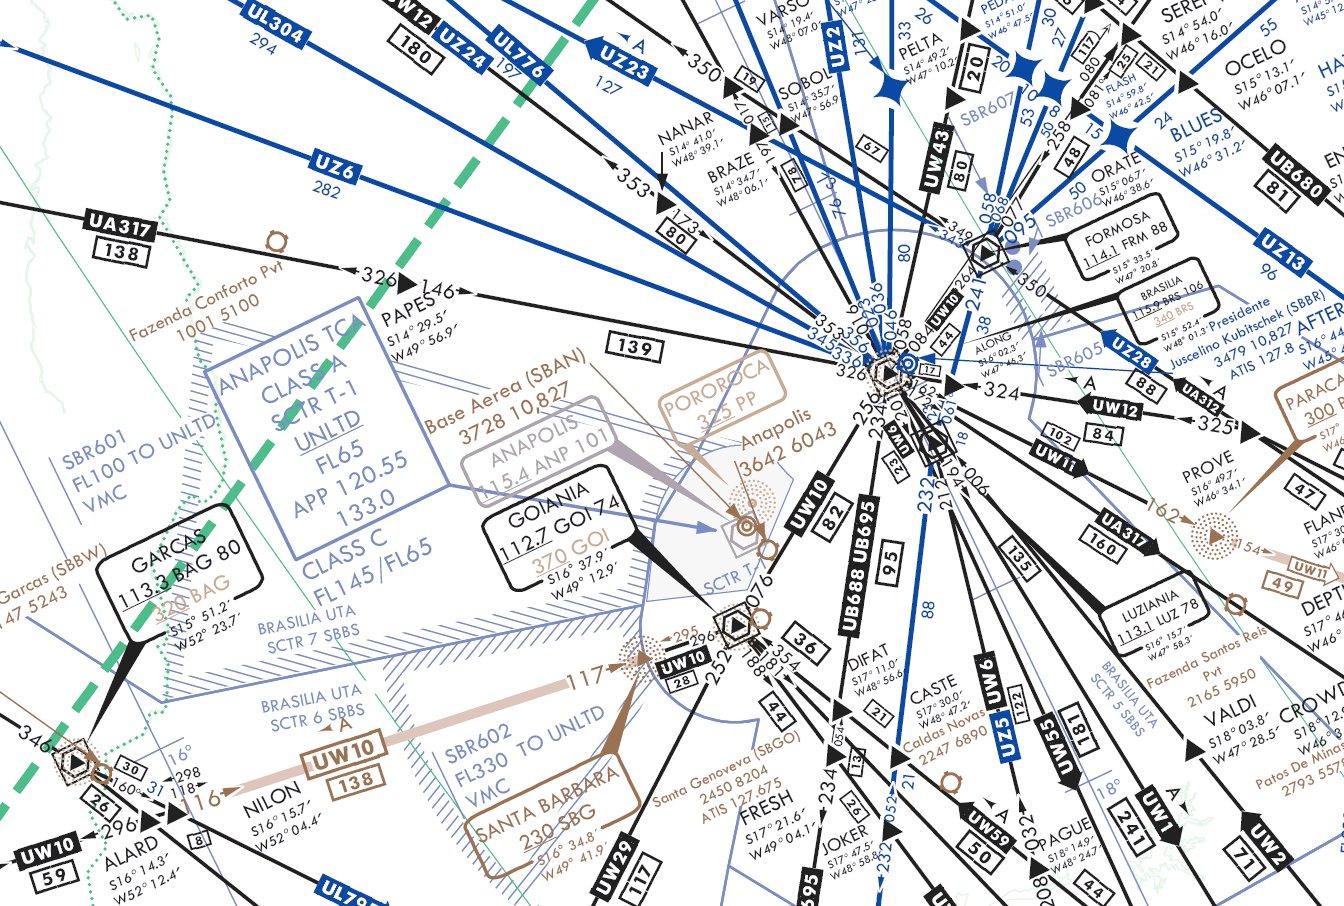 File ifr high altitude en route chart brasilia uw2 uz6